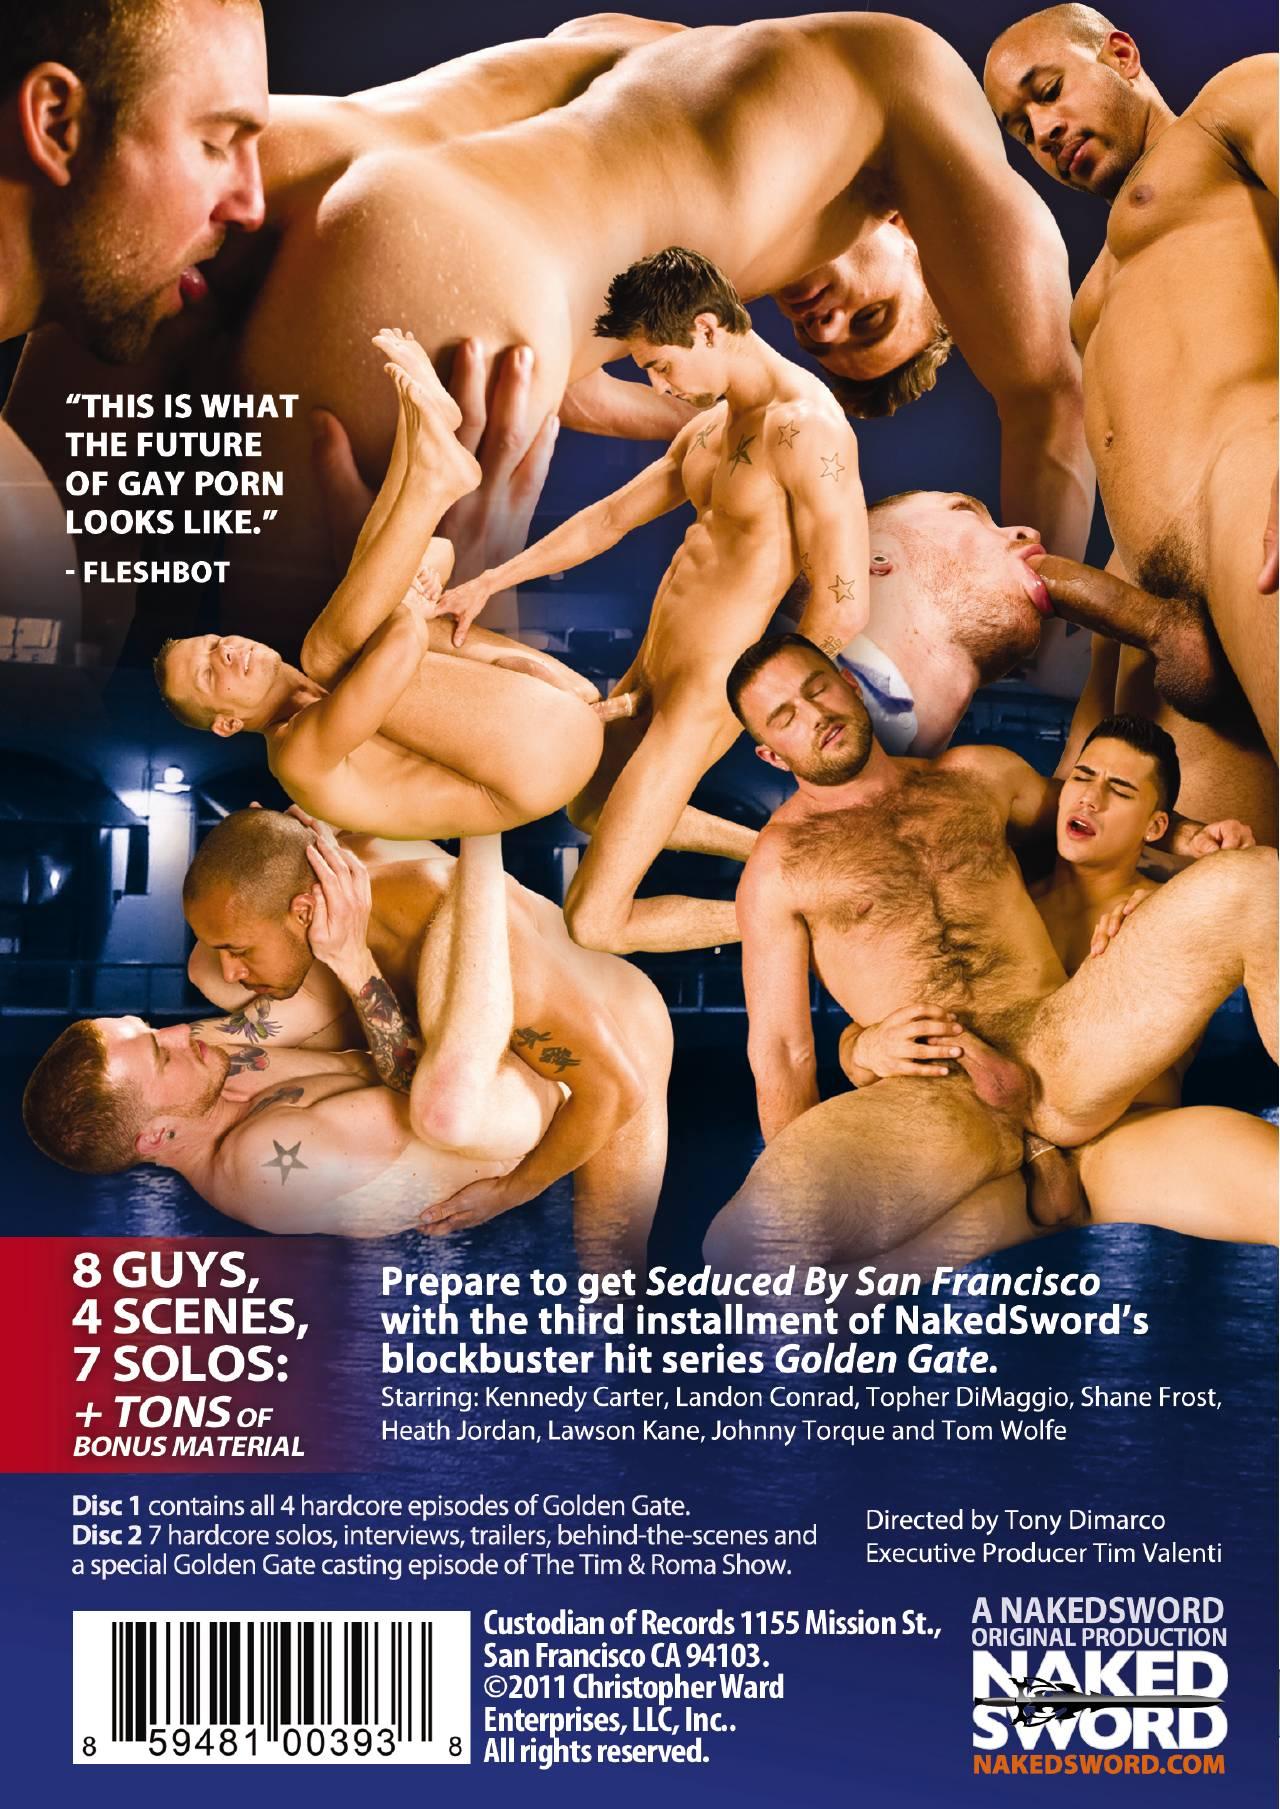 porn Sextourismus San Francisco und Denver words